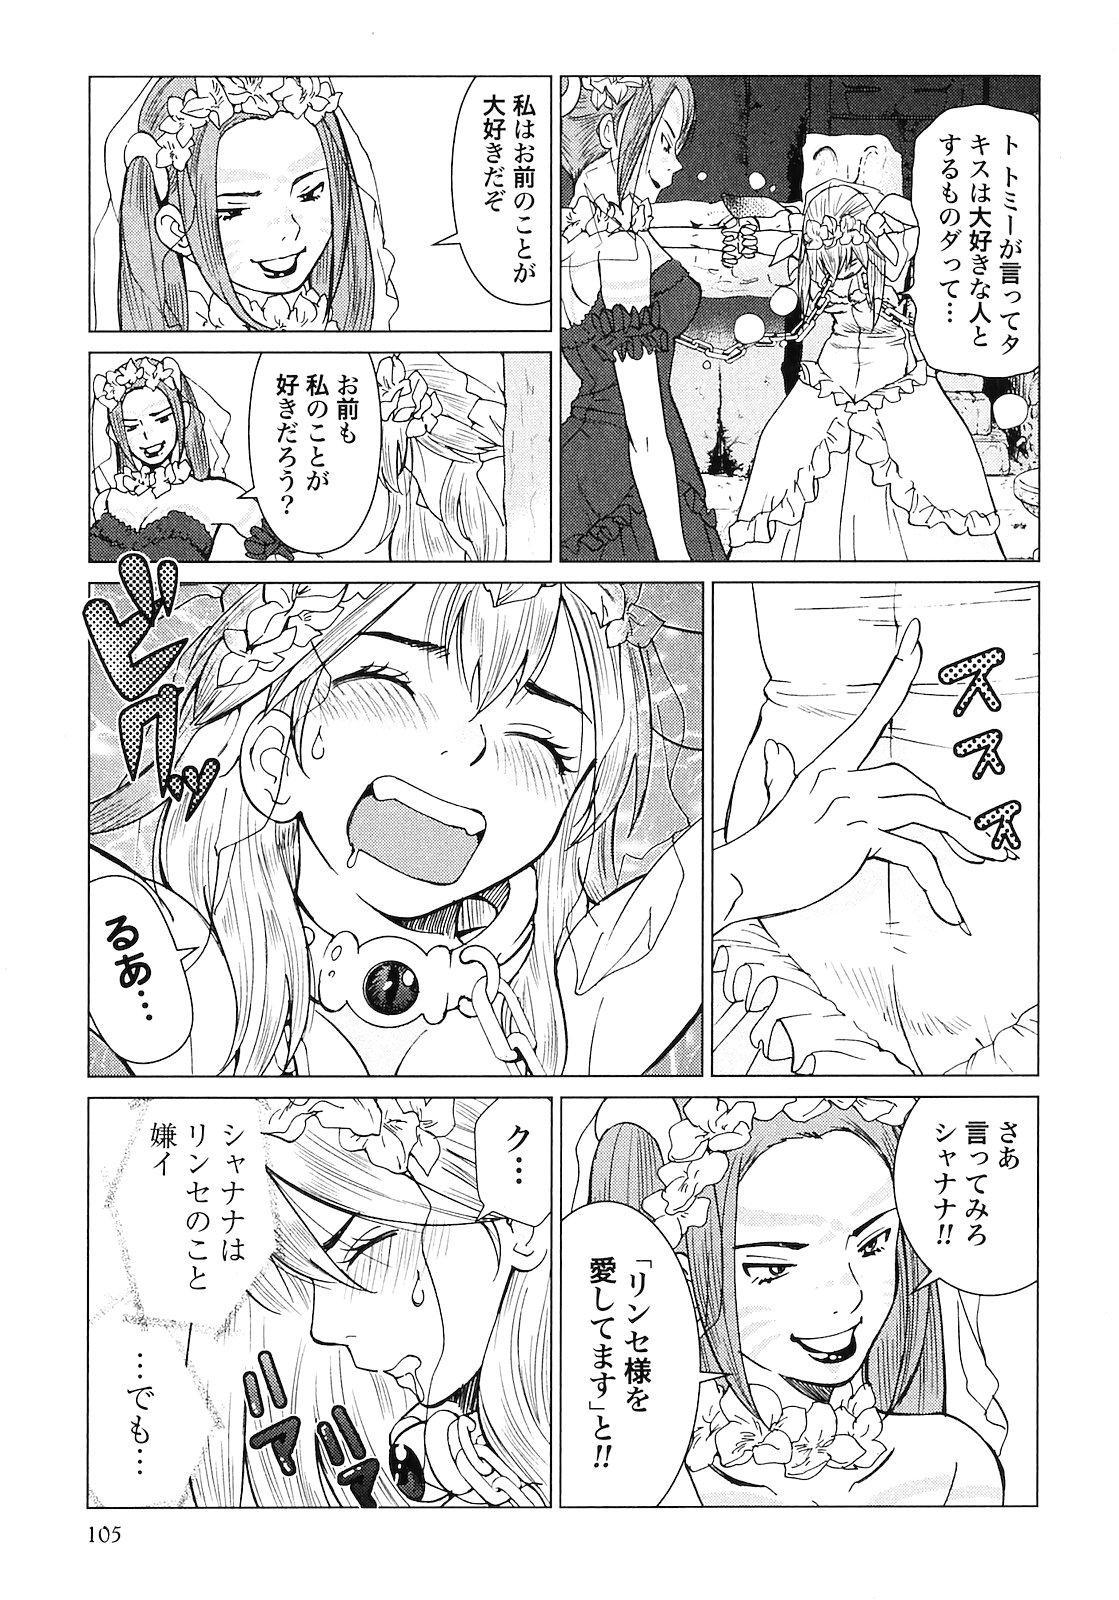 Makyo no Shanana Vol.02 106